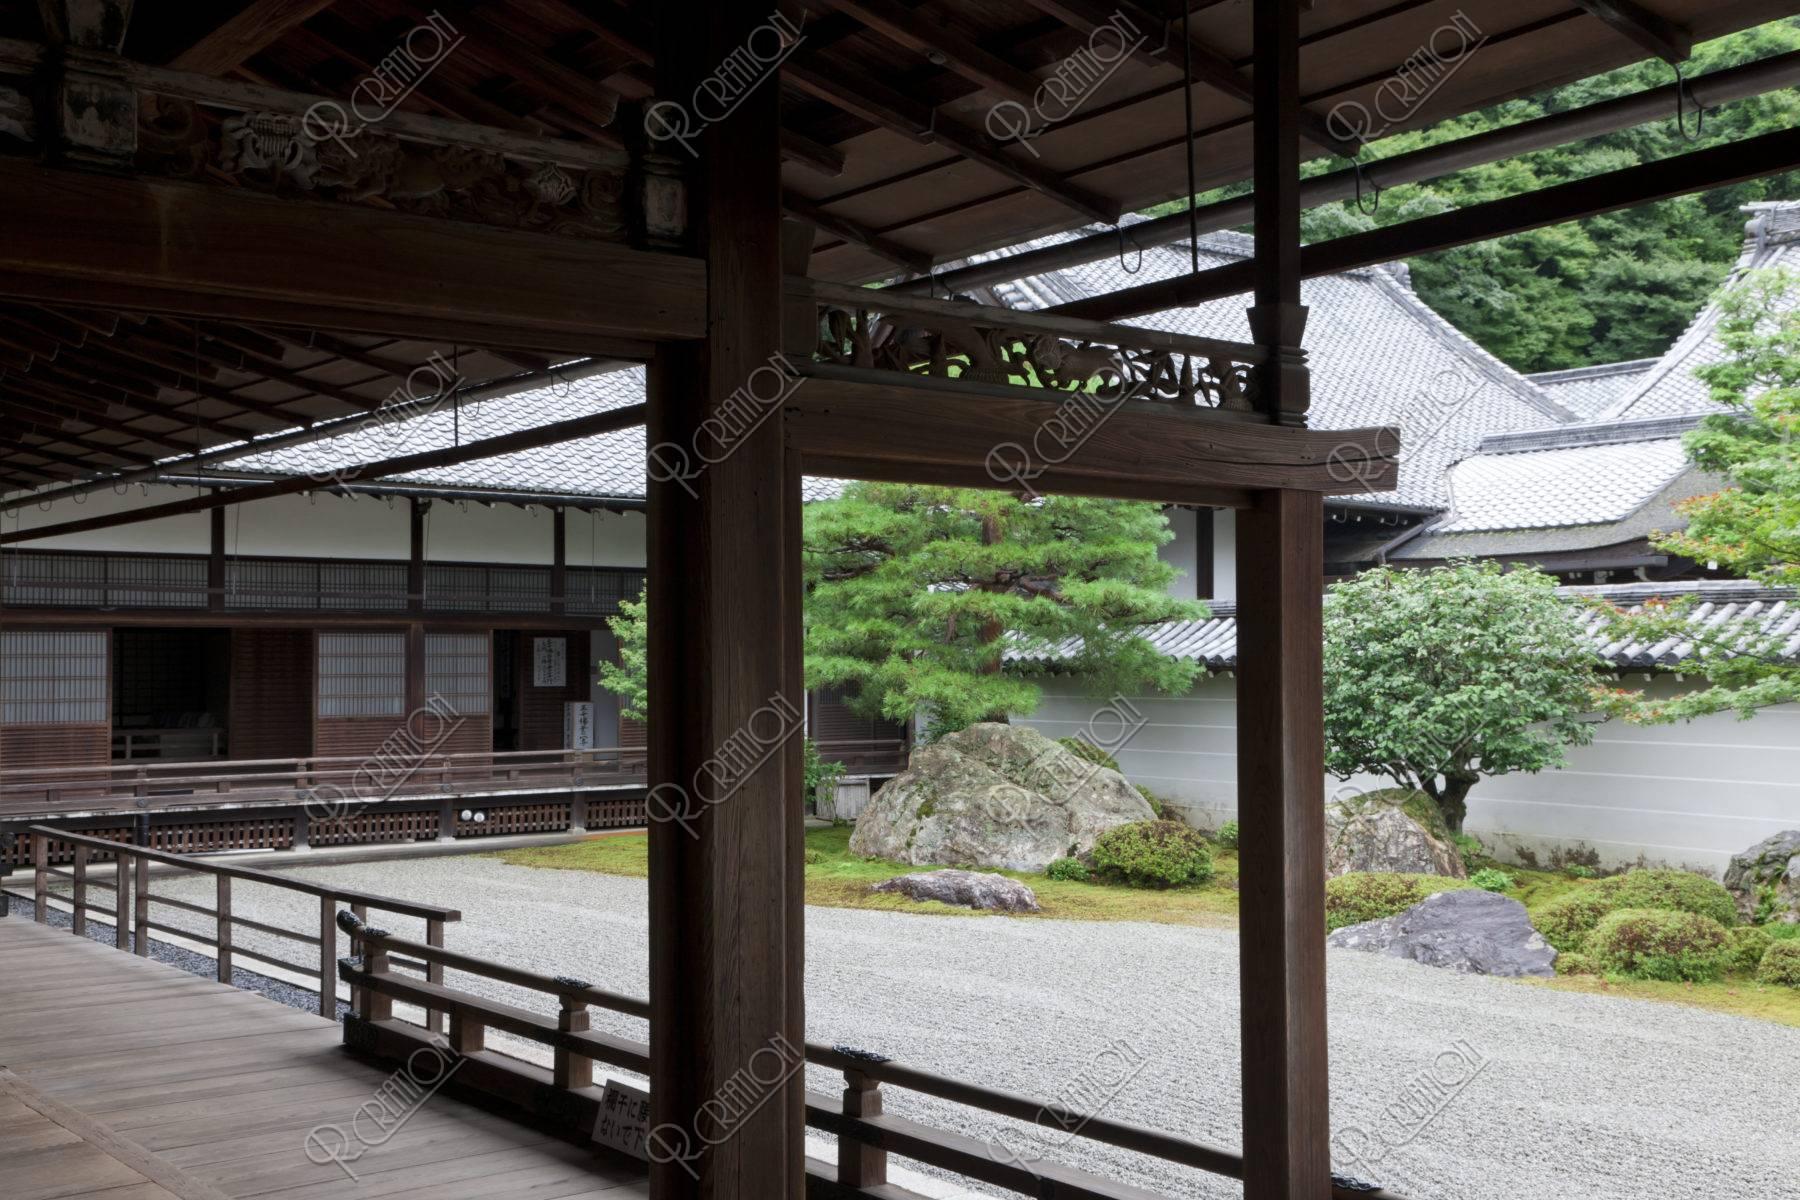 南禅寺 欄間と石庭